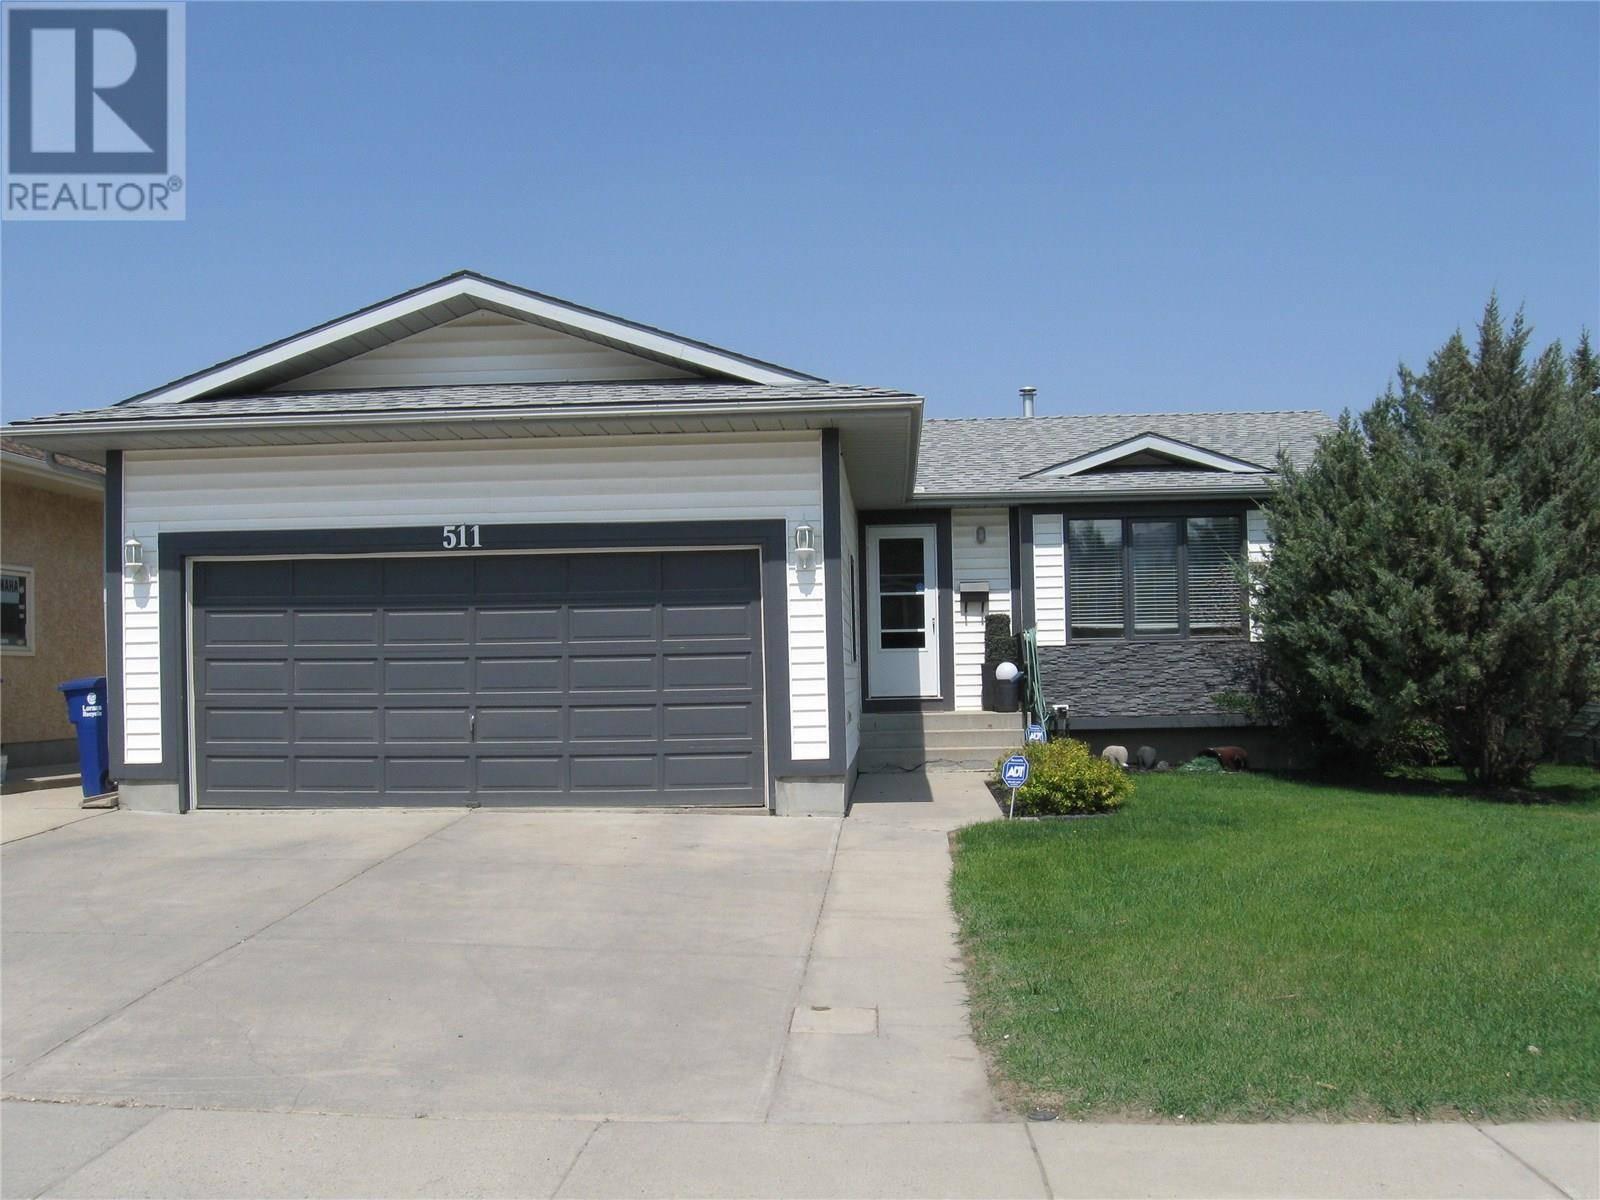 House for sale at 511 Nemeiben Rd Saskatoon Saskatchewan - MLS: SK779787